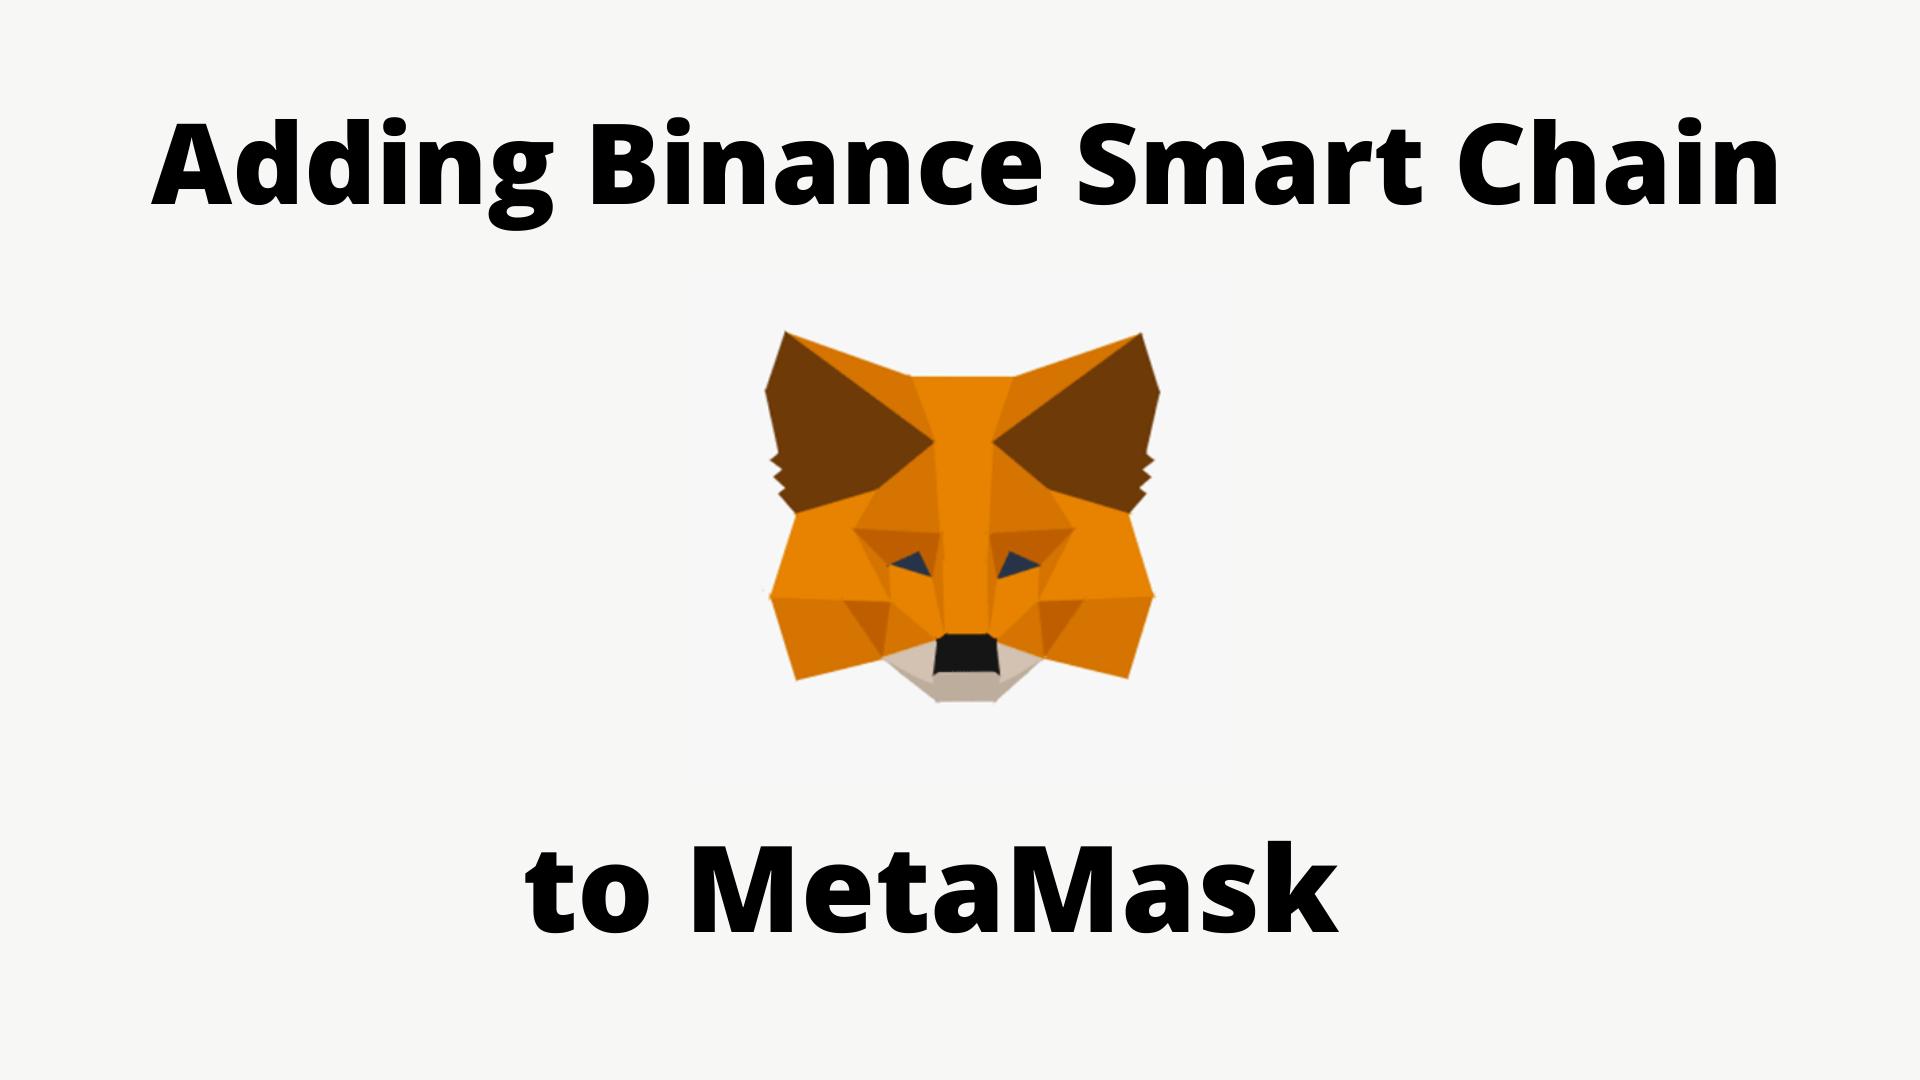 How to add Binance Smart Chain to MetaMask